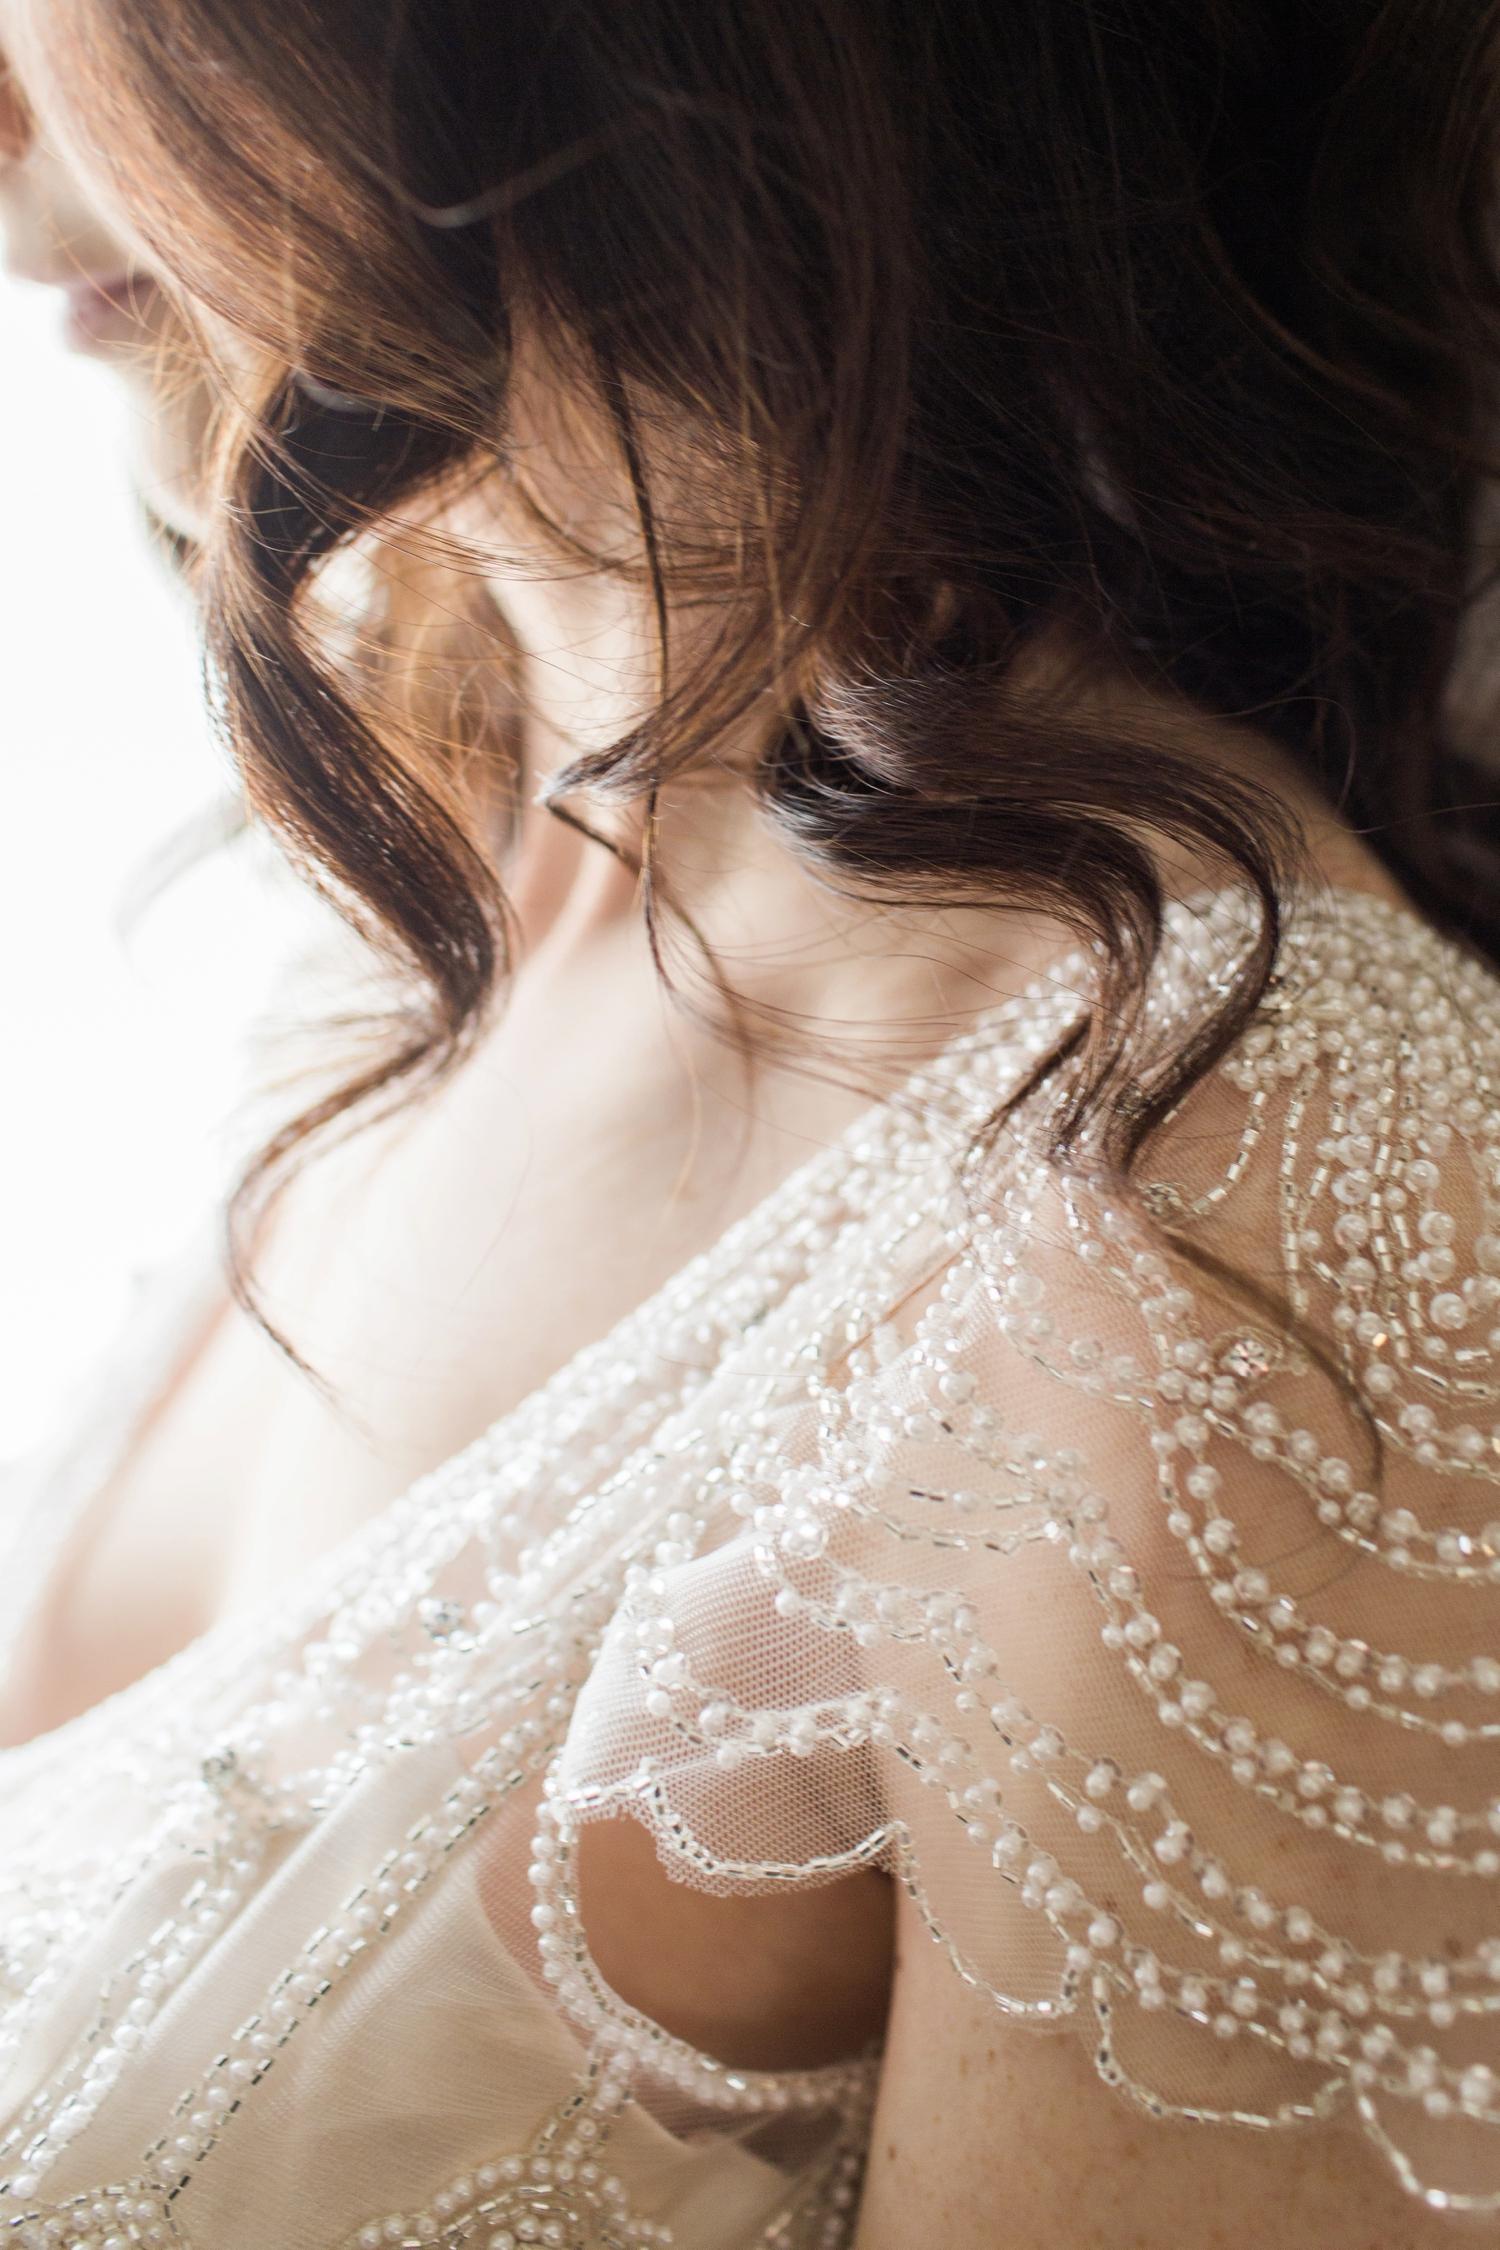 Bell_Event_Centre_Cincinnati_Ohio_Wedding_Photography_Chloe_Luka_Photography_6403.jpg